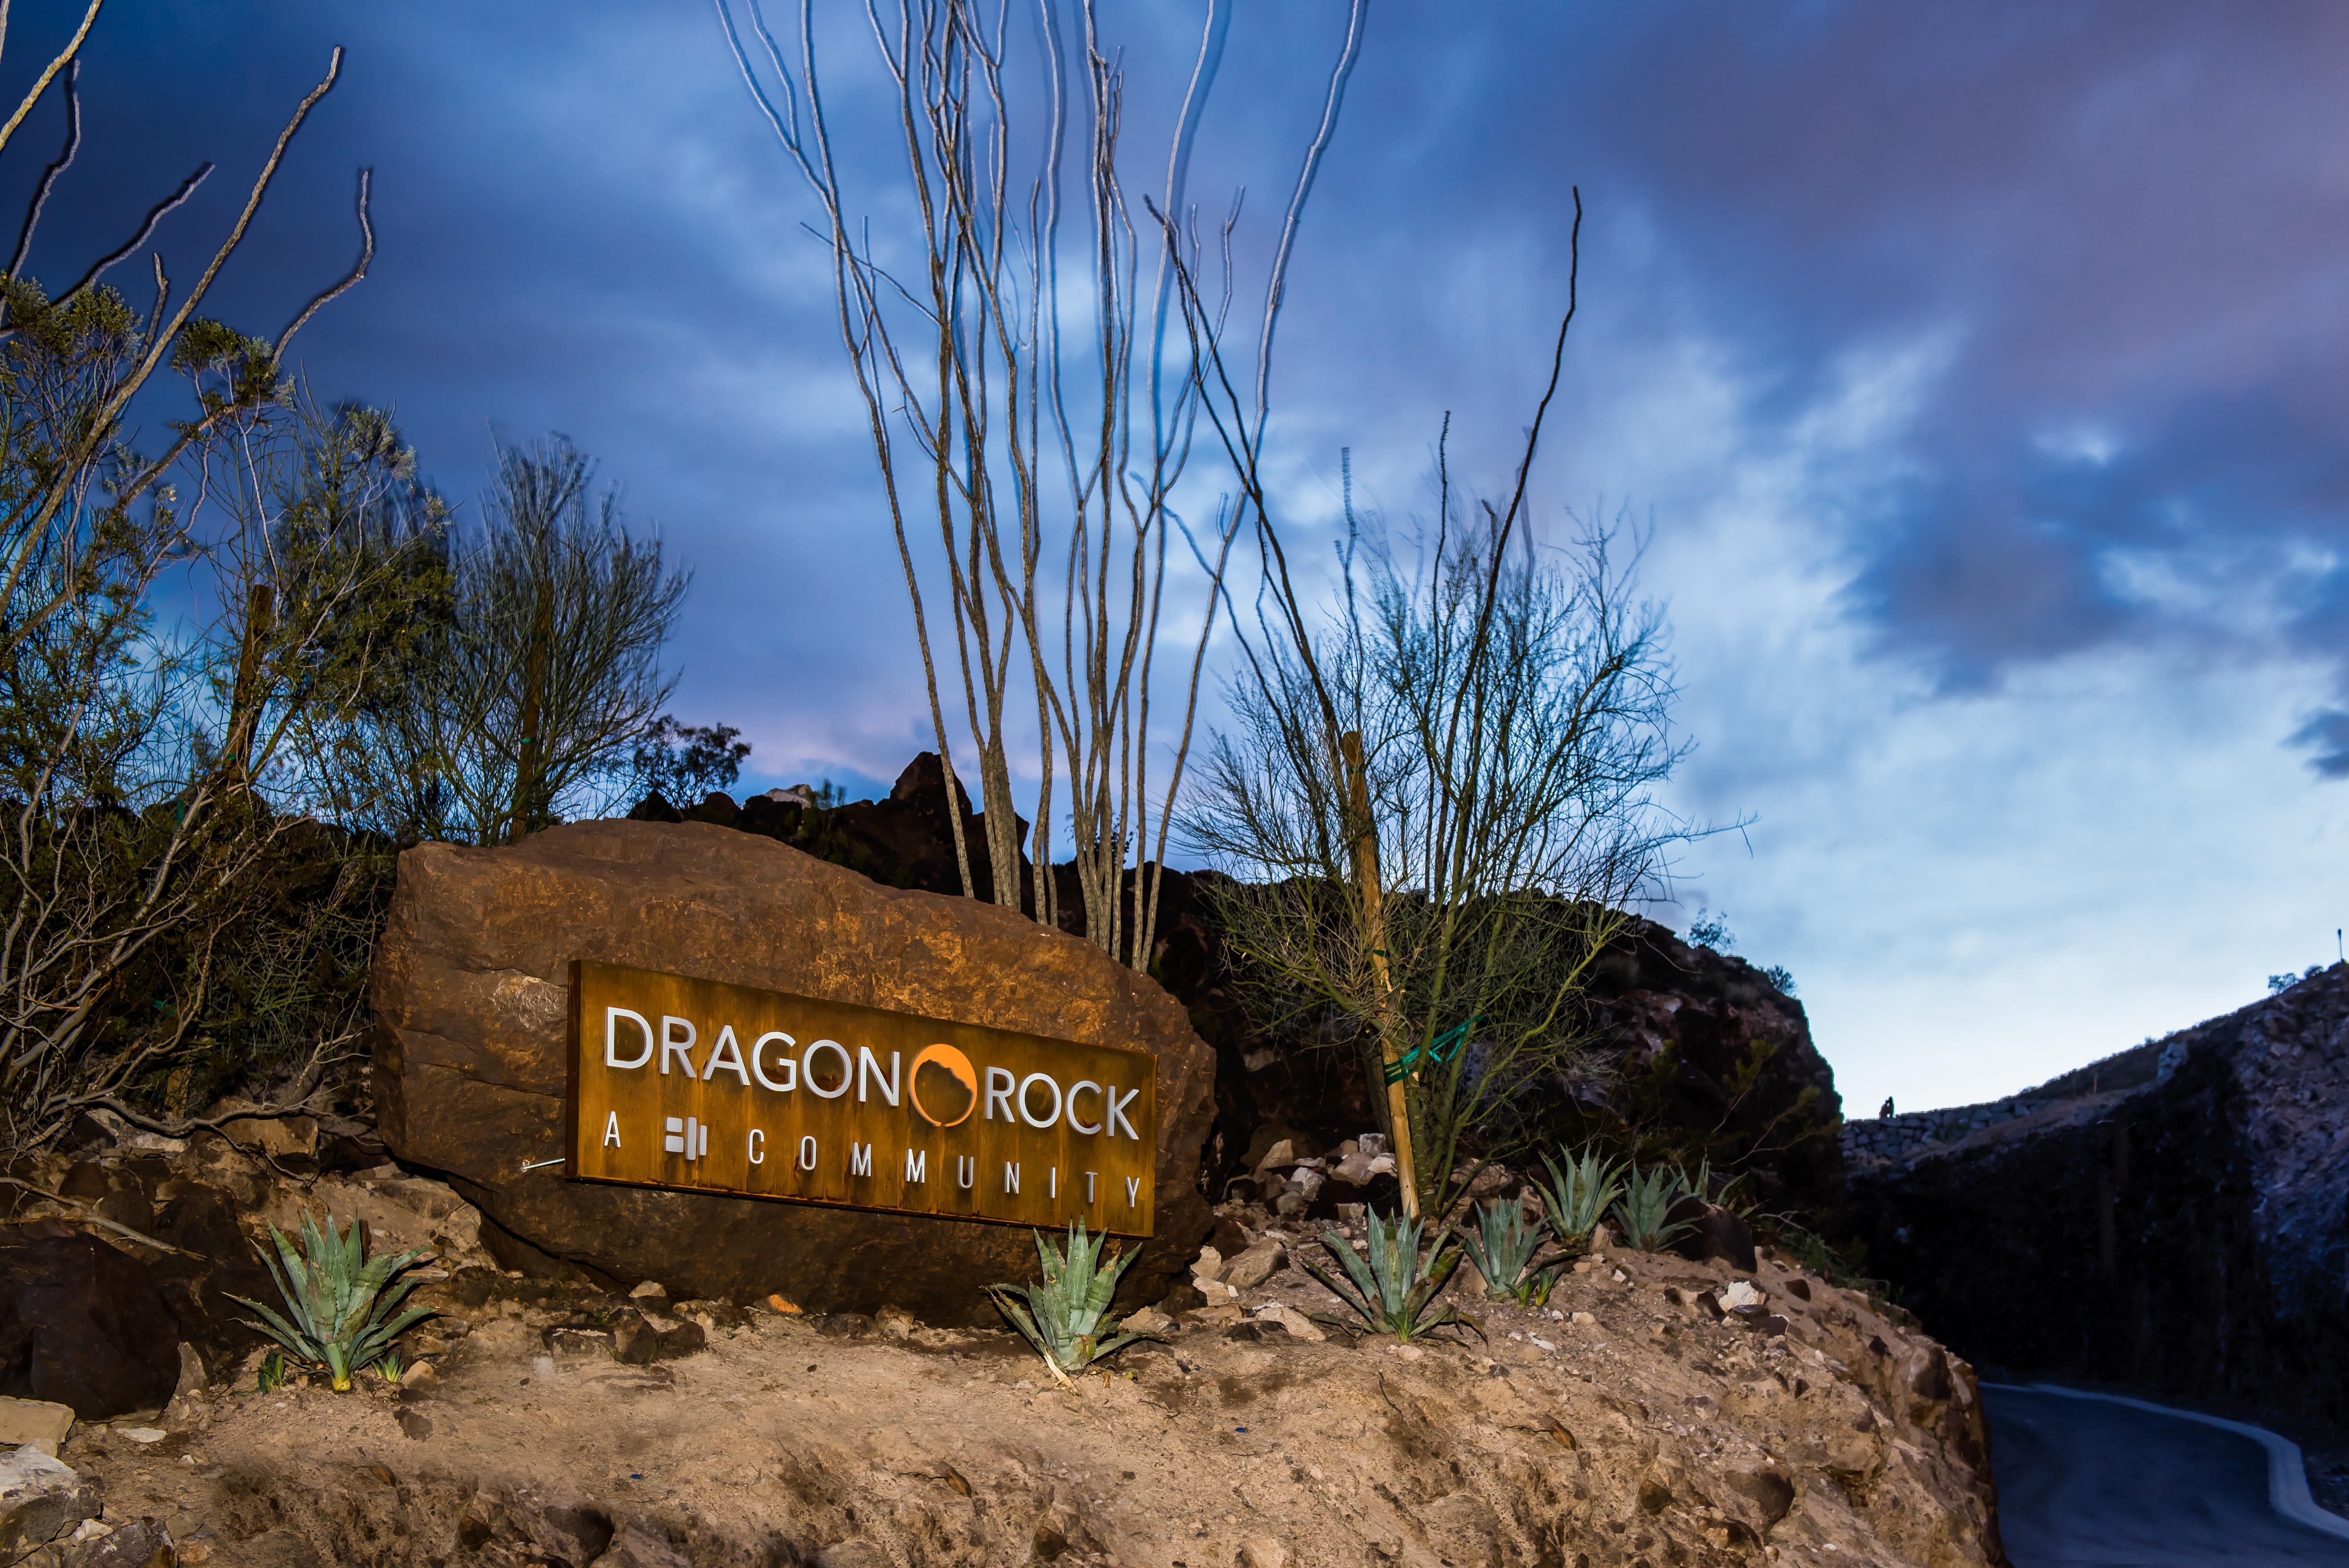 'Dragon Rock' by Blue Heron in Las Vegas